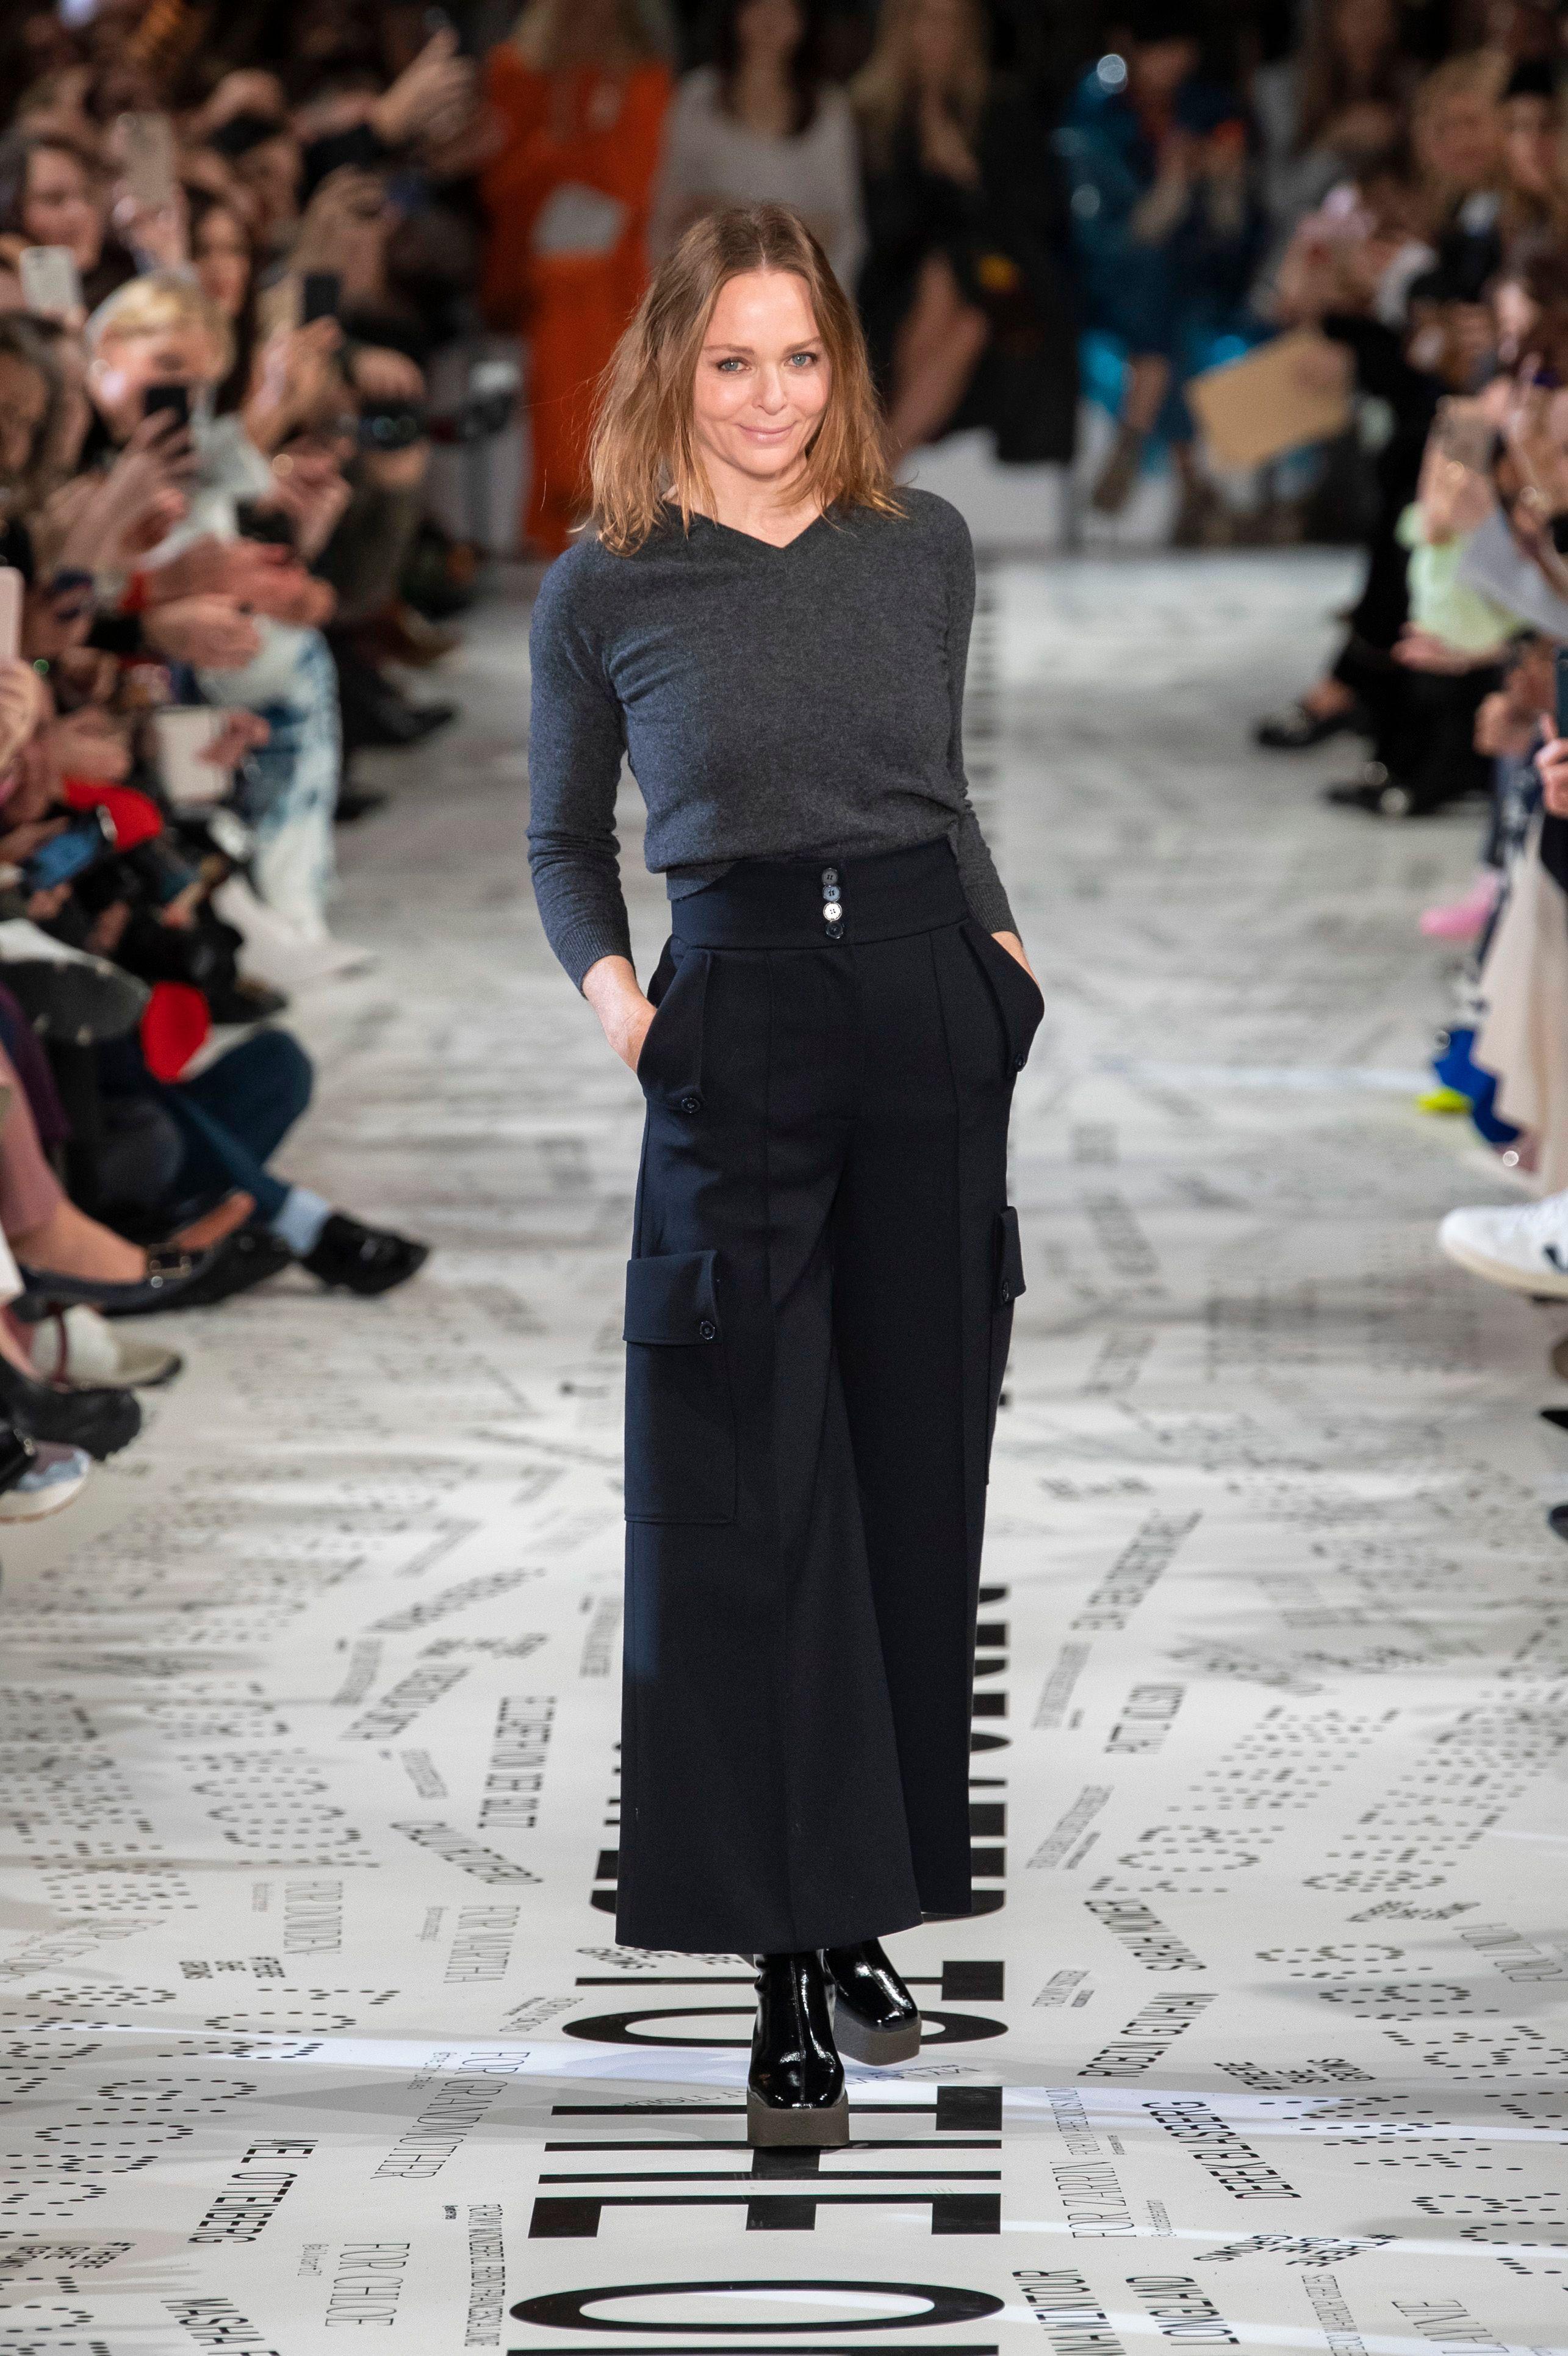 Stella McCartney on the catwalkStella McCartney show, Runway, Fall Winter 2019, Paris Fashion Week, France - 04 Mar 2019